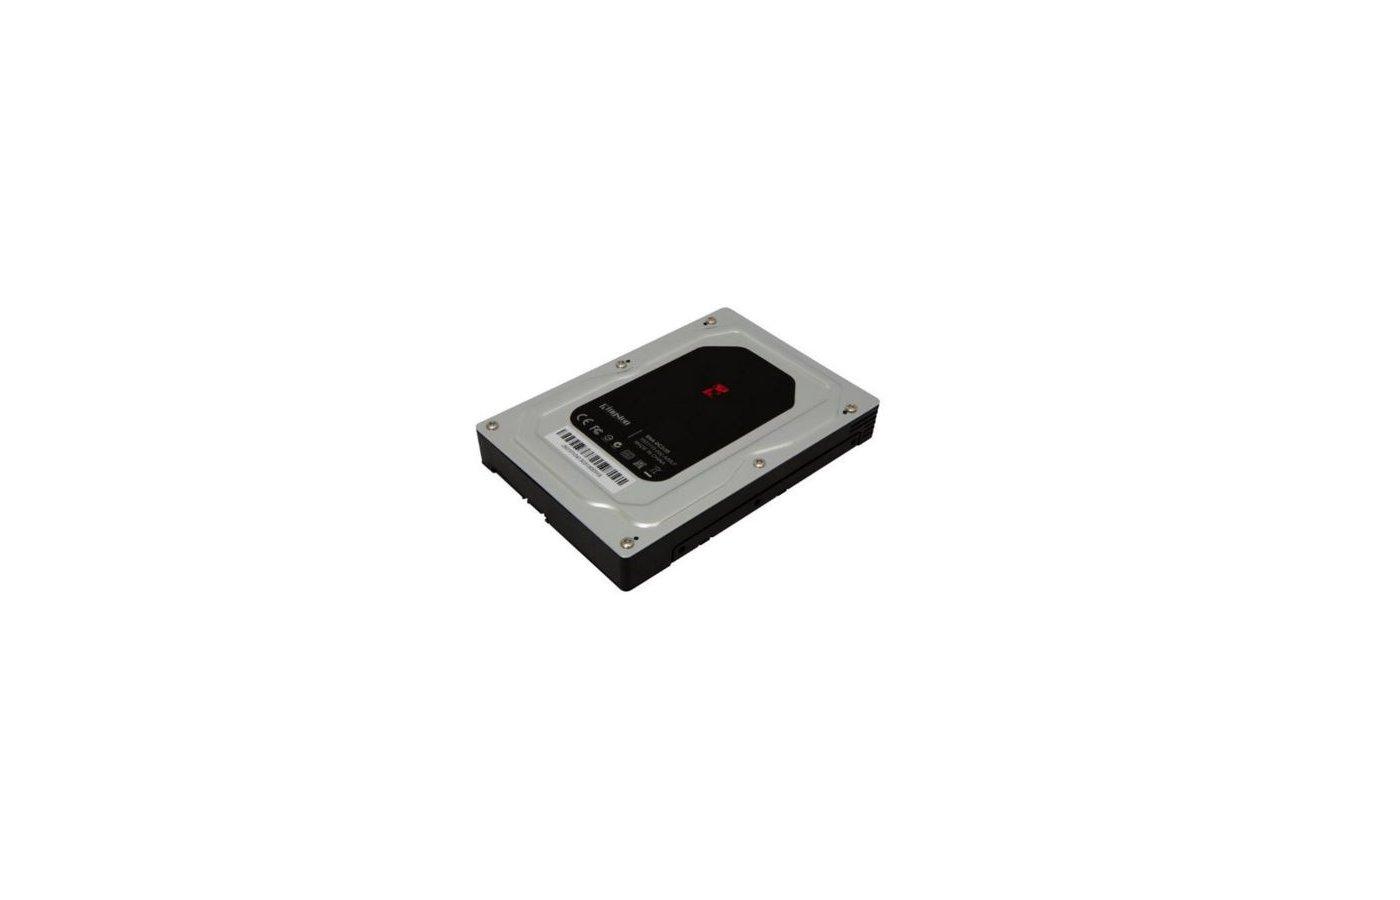 "Корпус для жесткого диска Kingston SNA-DC2/35 2.5"" to 3.5"" SATA Drive Carrier gen2"